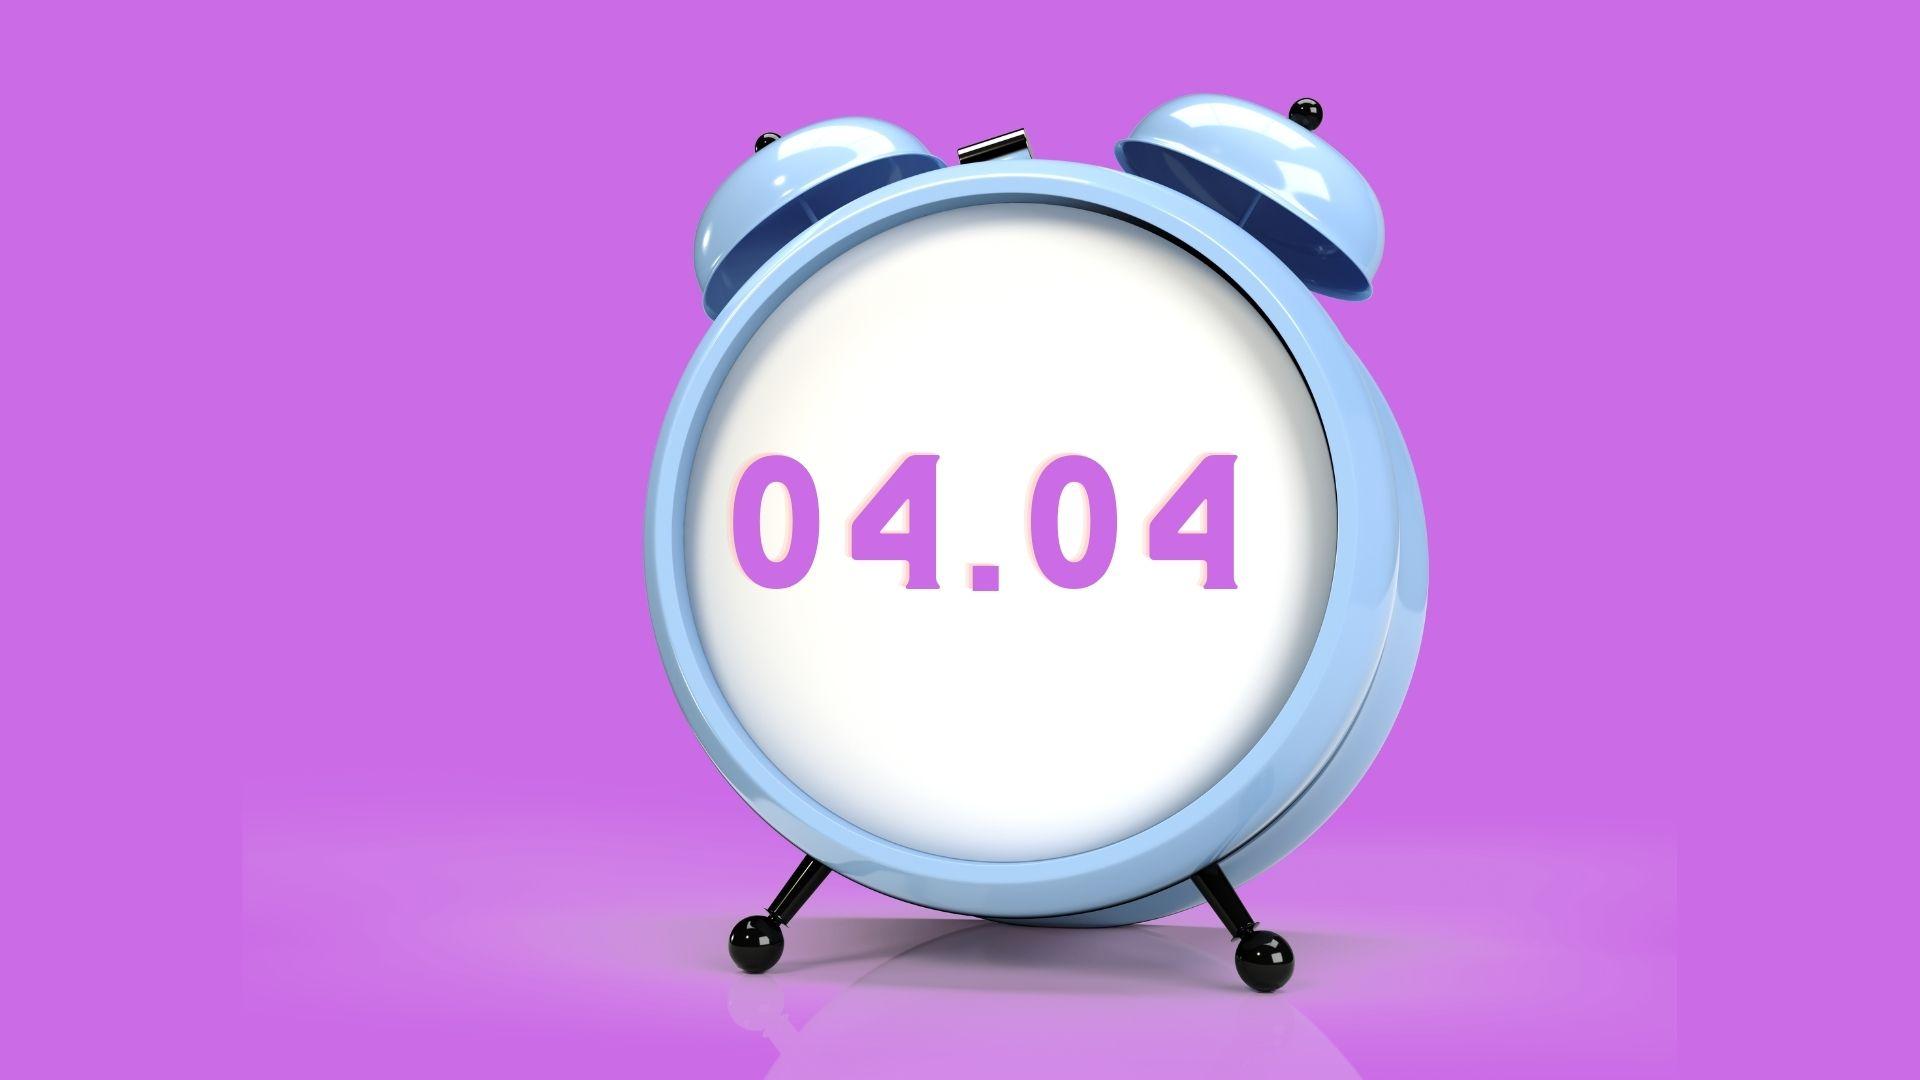 04.04 Saat Anlamı